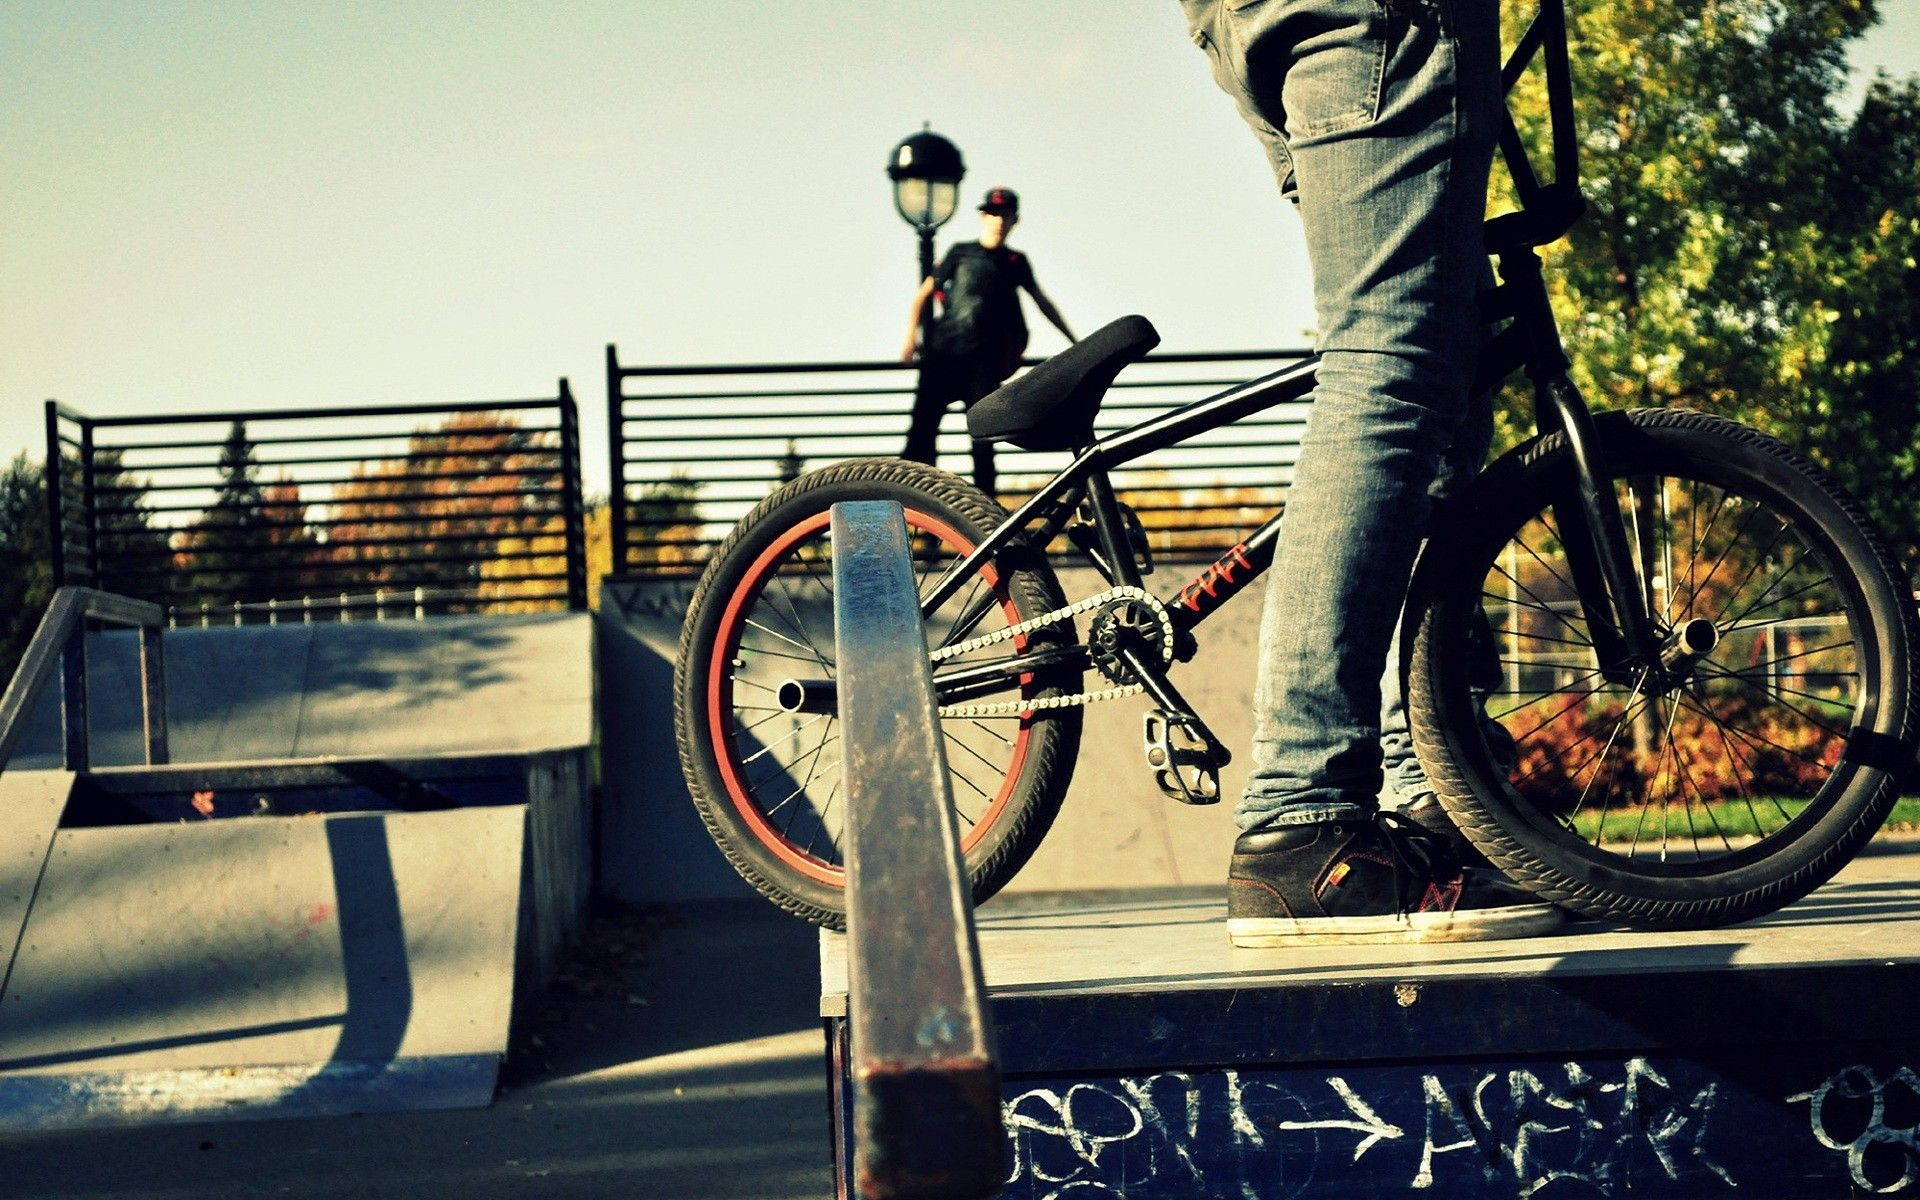 Pin By Ghuru Sports On Life On Wheels Bike Freestyle Bmx Bmx Freestyle